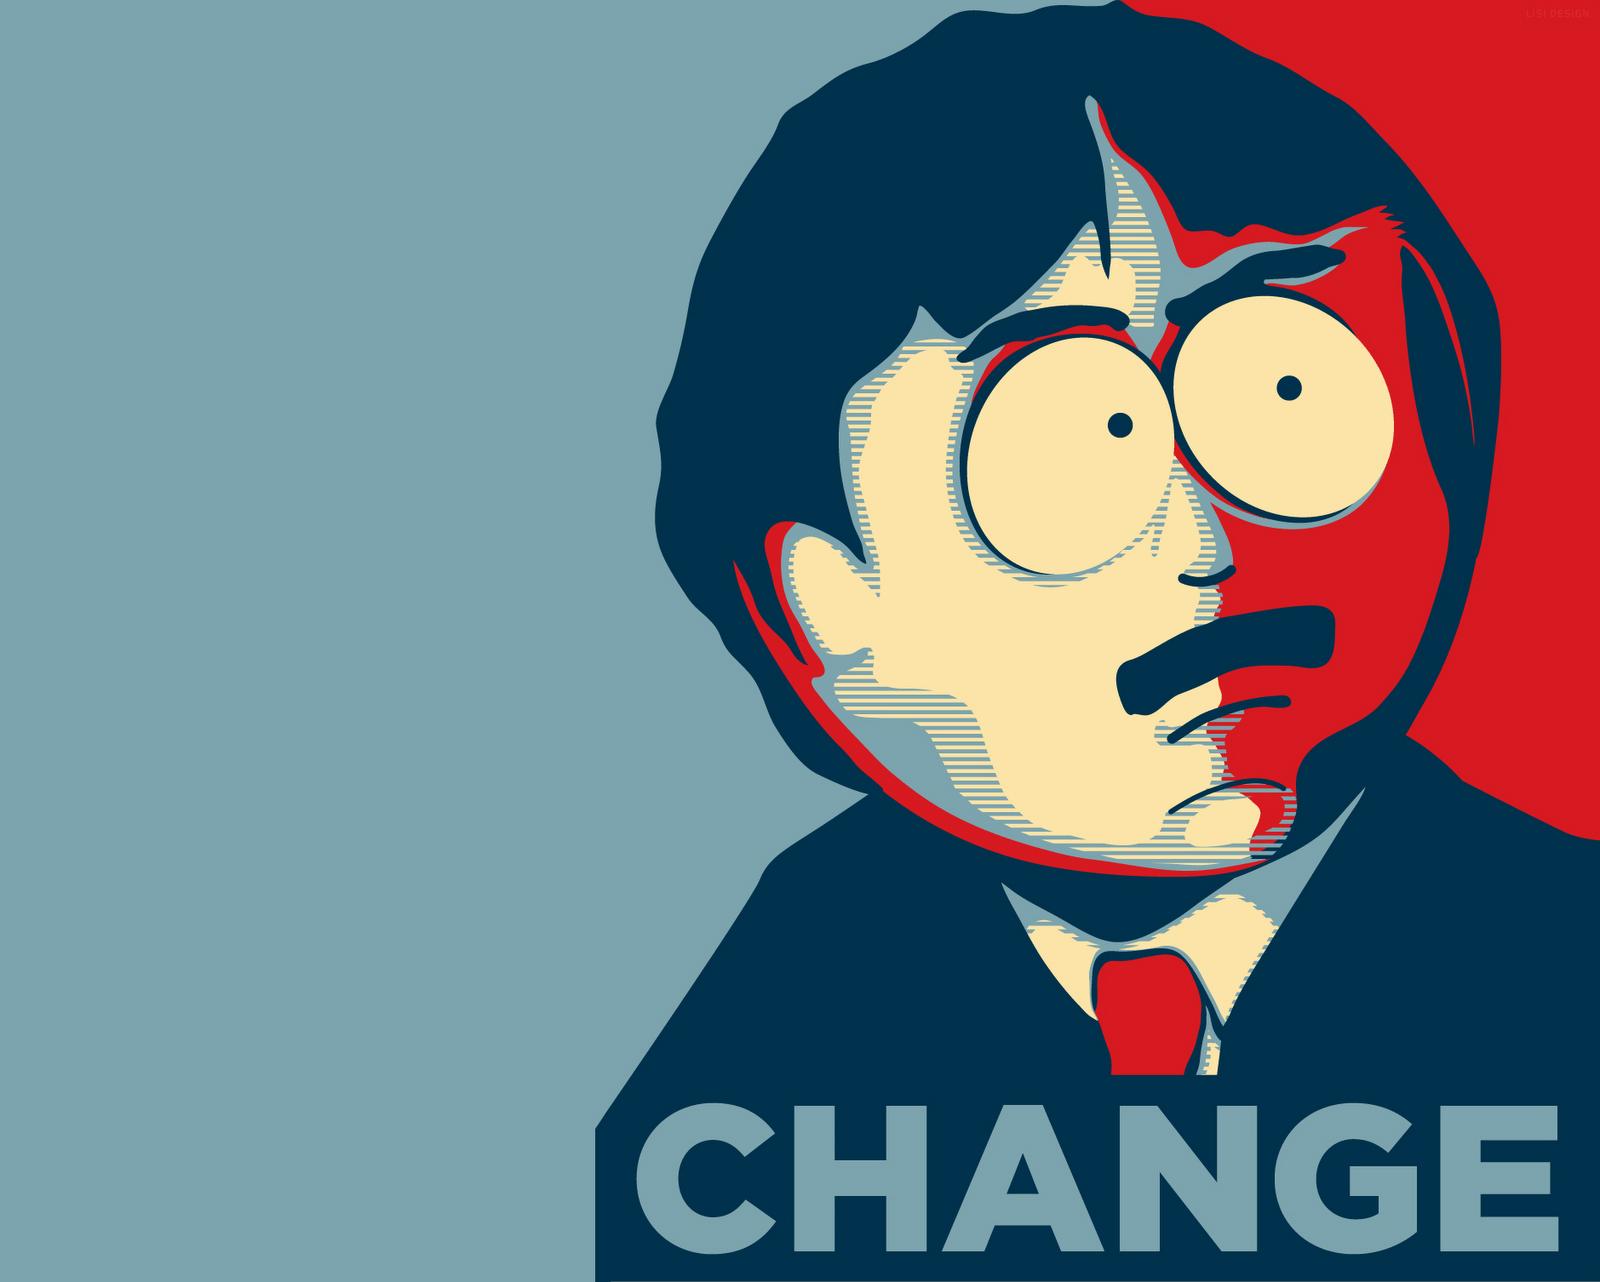 Wallpaper Kyle South Park | Black Wallpapers For Desktop